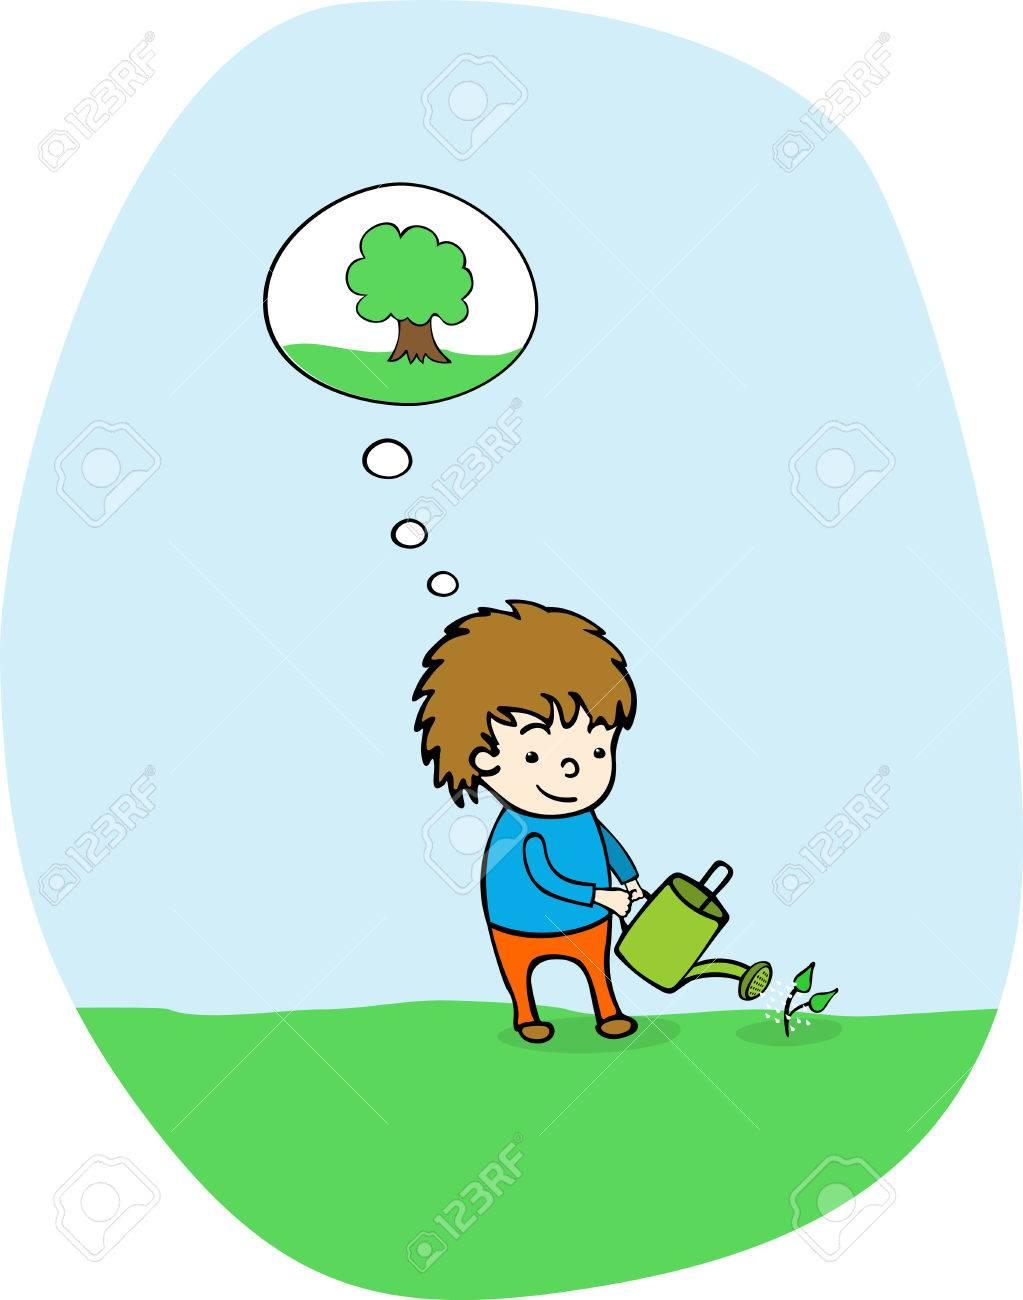 Plant a tree Stock Vector - 8825448